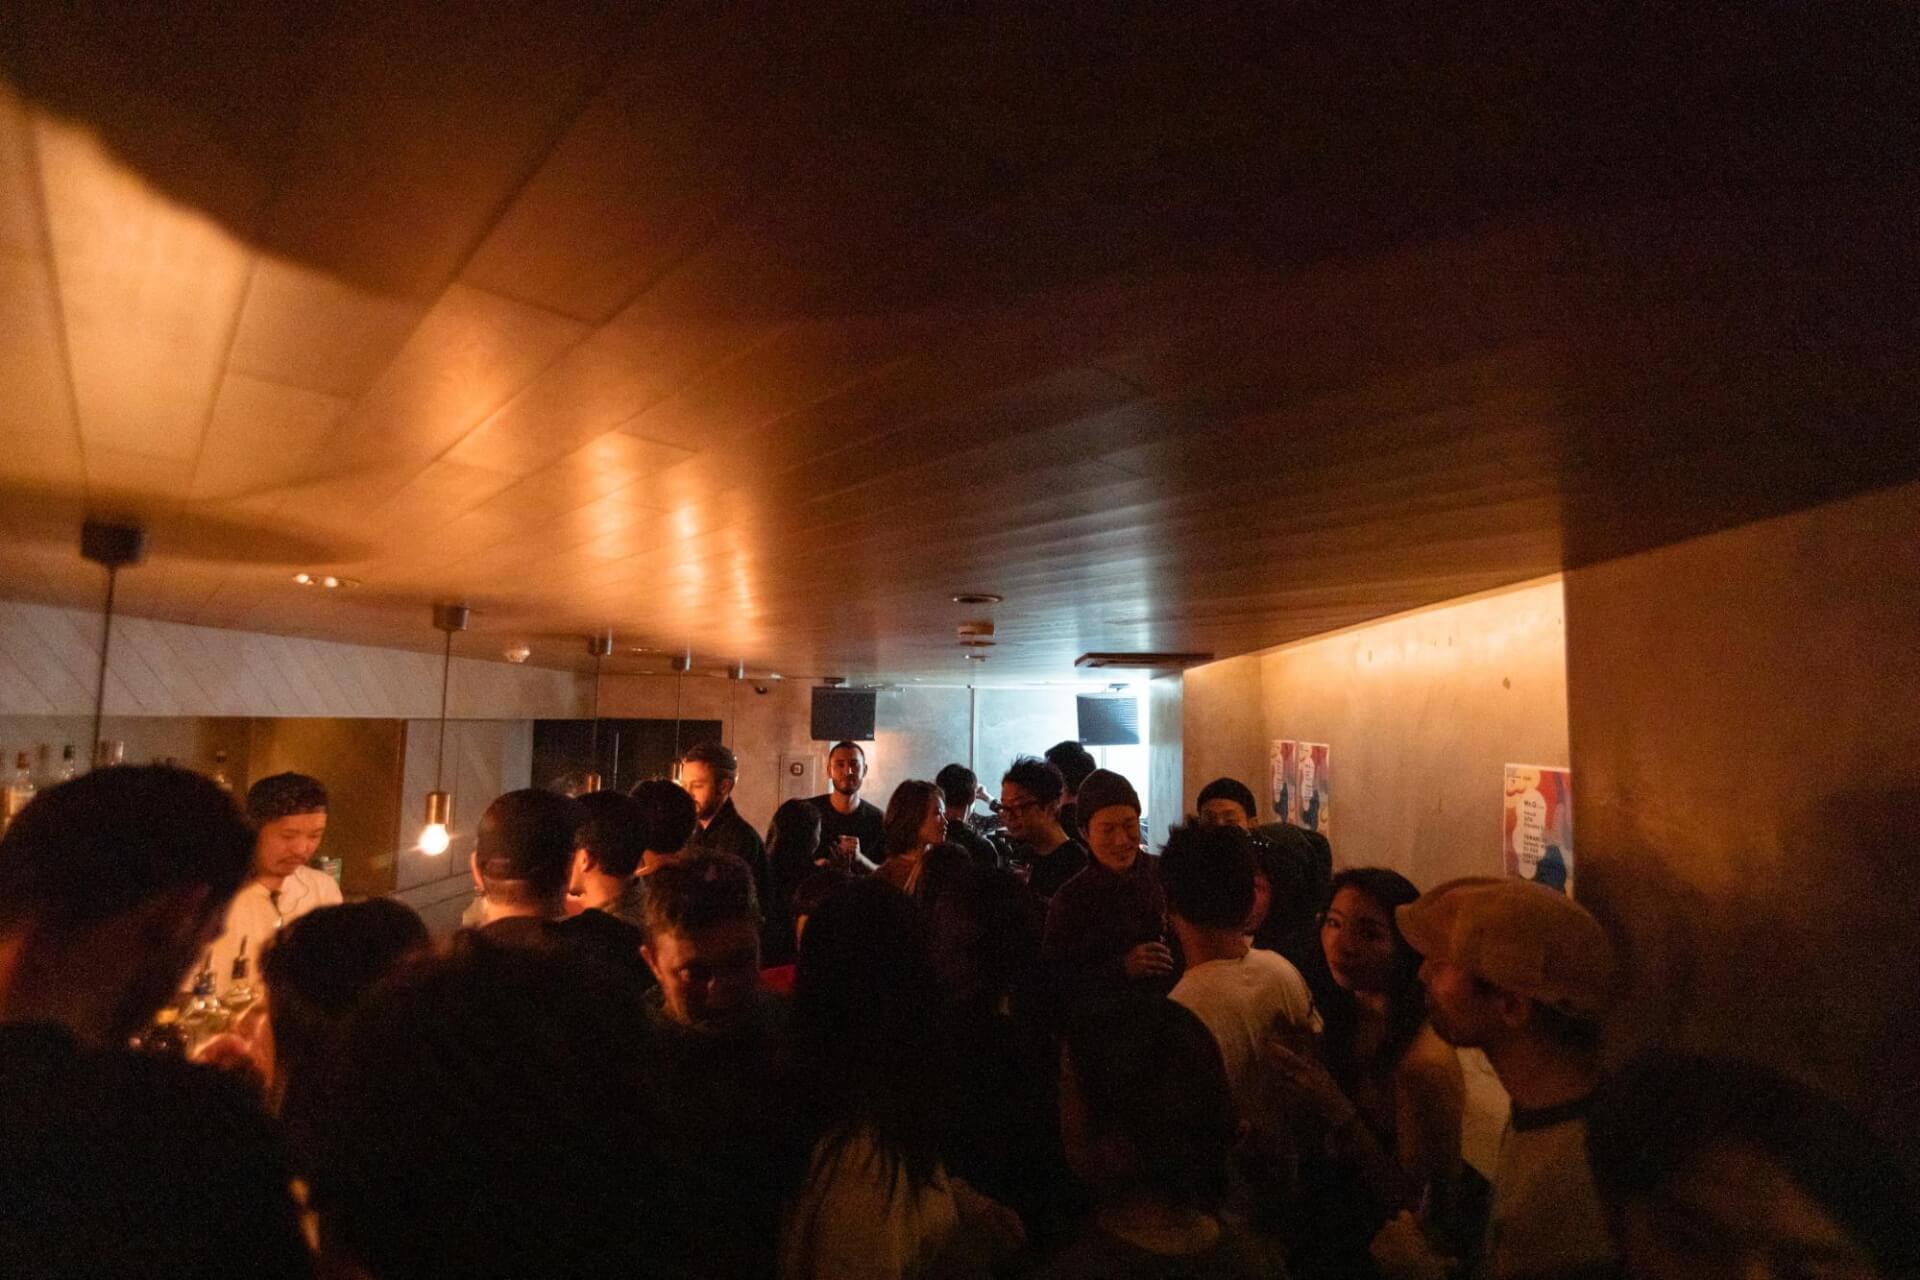 Floating Points at KEWL 2nd Anniversary Party。ダンスミュージックへの初期衝動を想い返した夜 music200116-kewl-floating-points-7